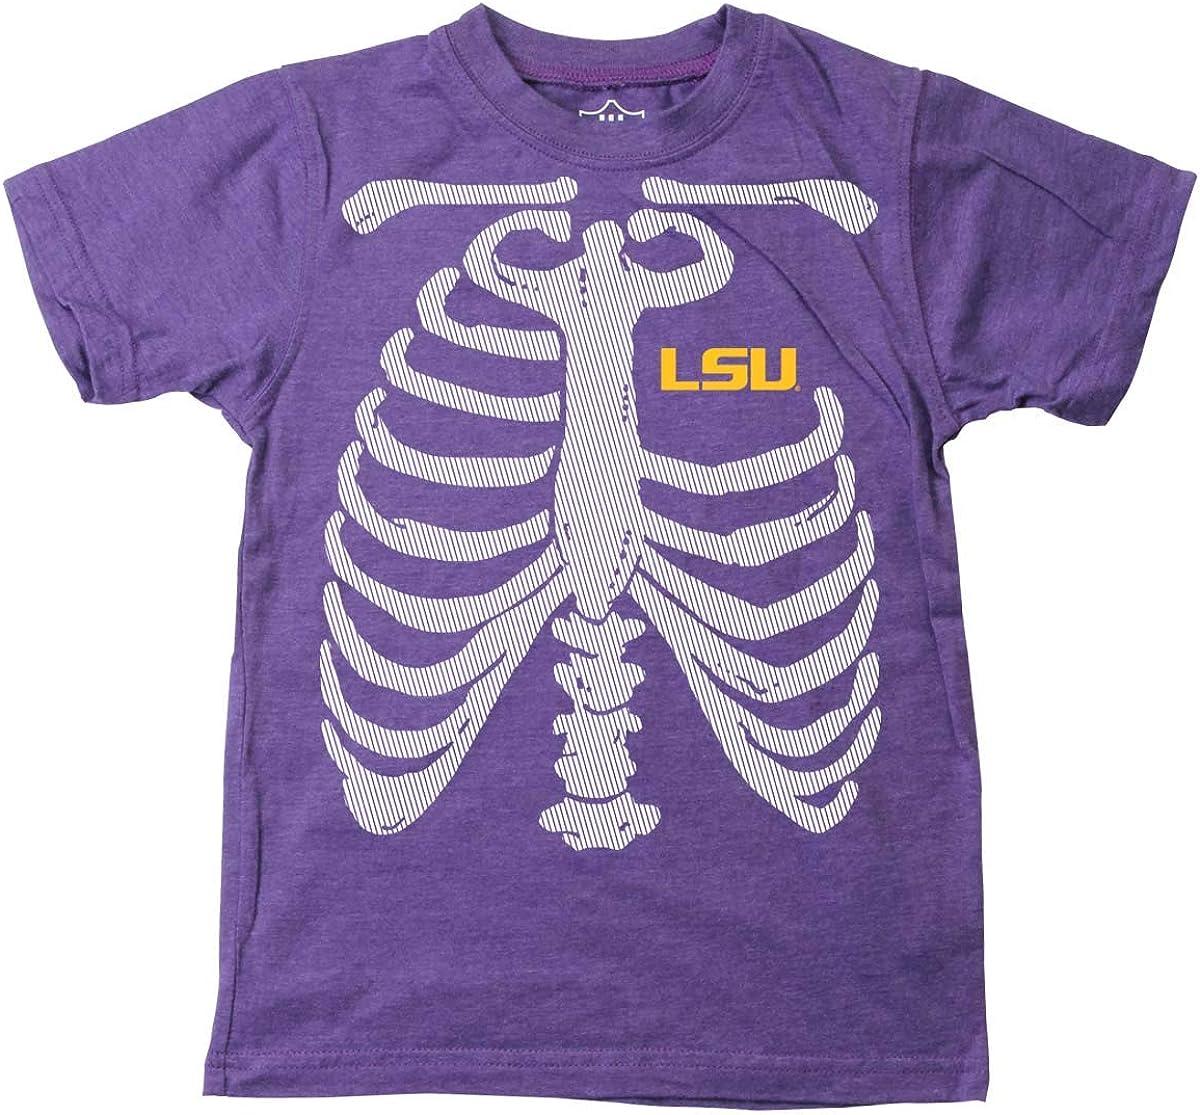 Wes & Willy LSU Tigers Boy's Glow Bones Tee